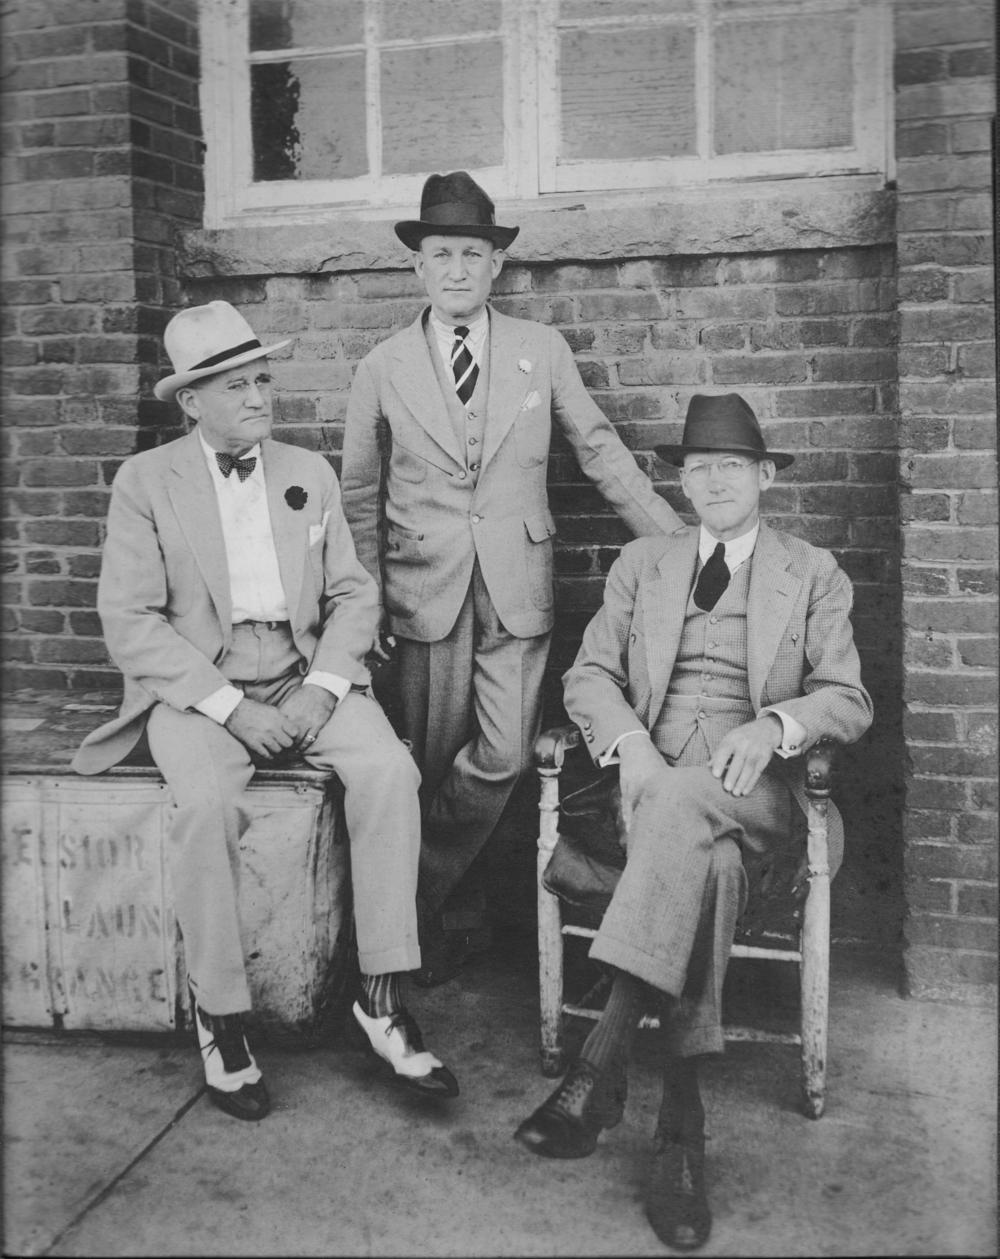 3 Allen Brothers B&W.jpg